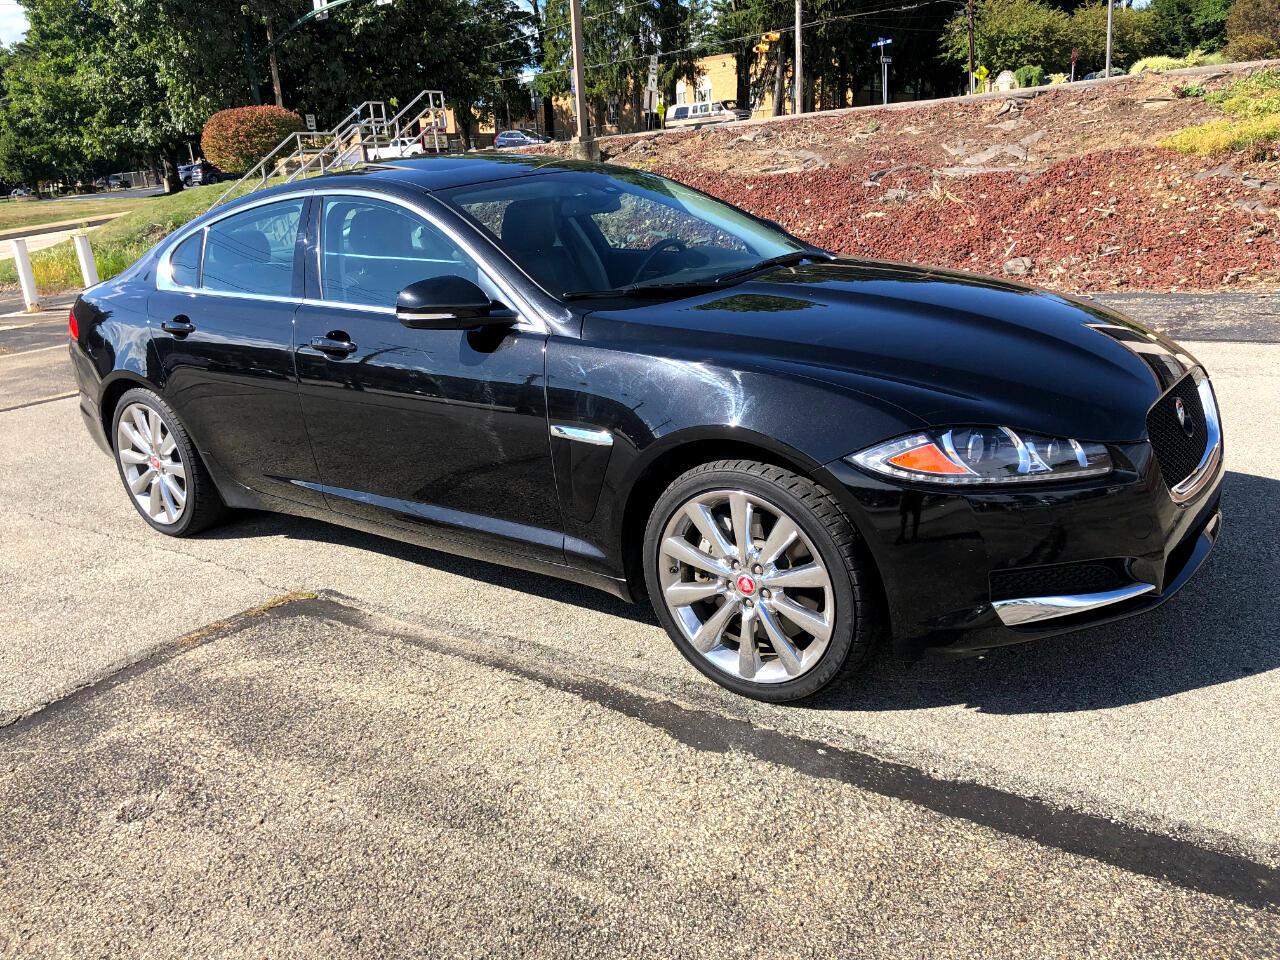 Jaguar XF-Series XF 3.0L V6 SC AWD 2014